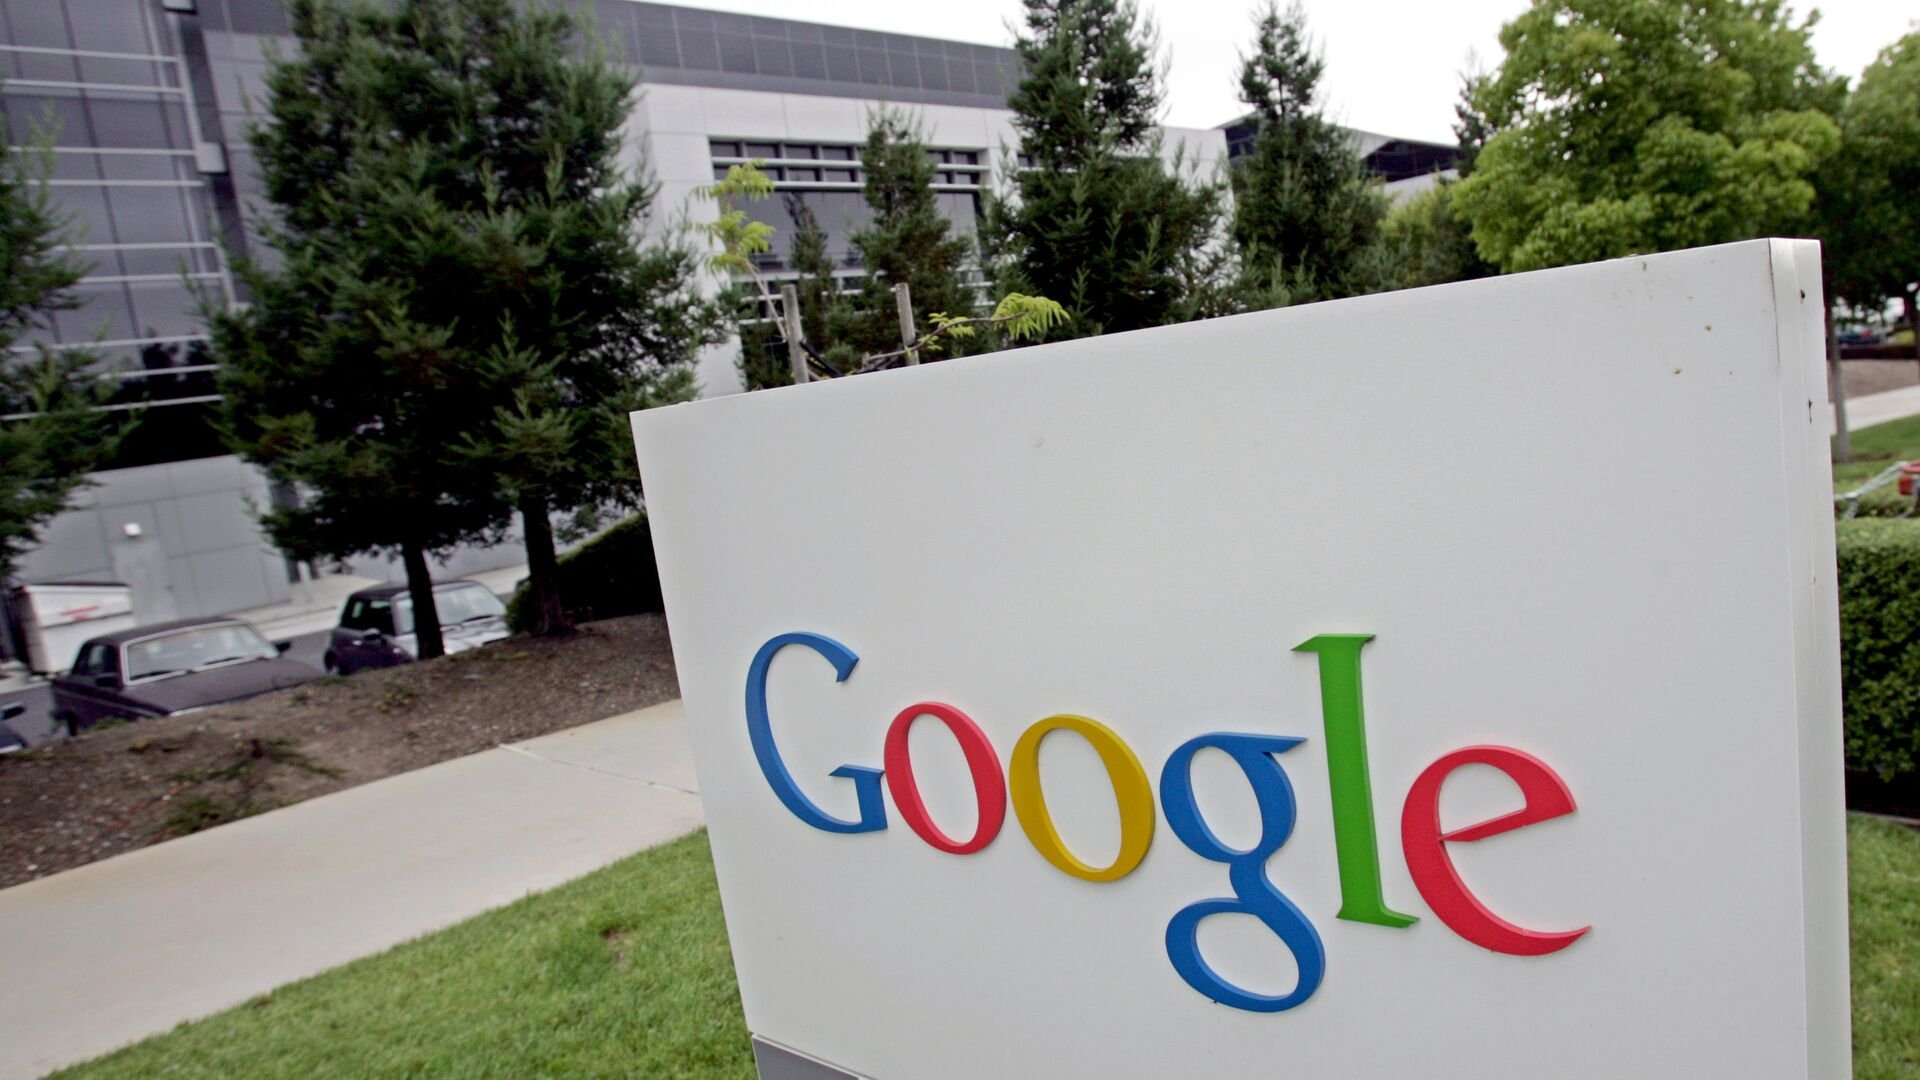 Штаб-квартира Google в Маунтин-Вью, штат Калифорния - РИА Новости, 1920, 25.05.2021